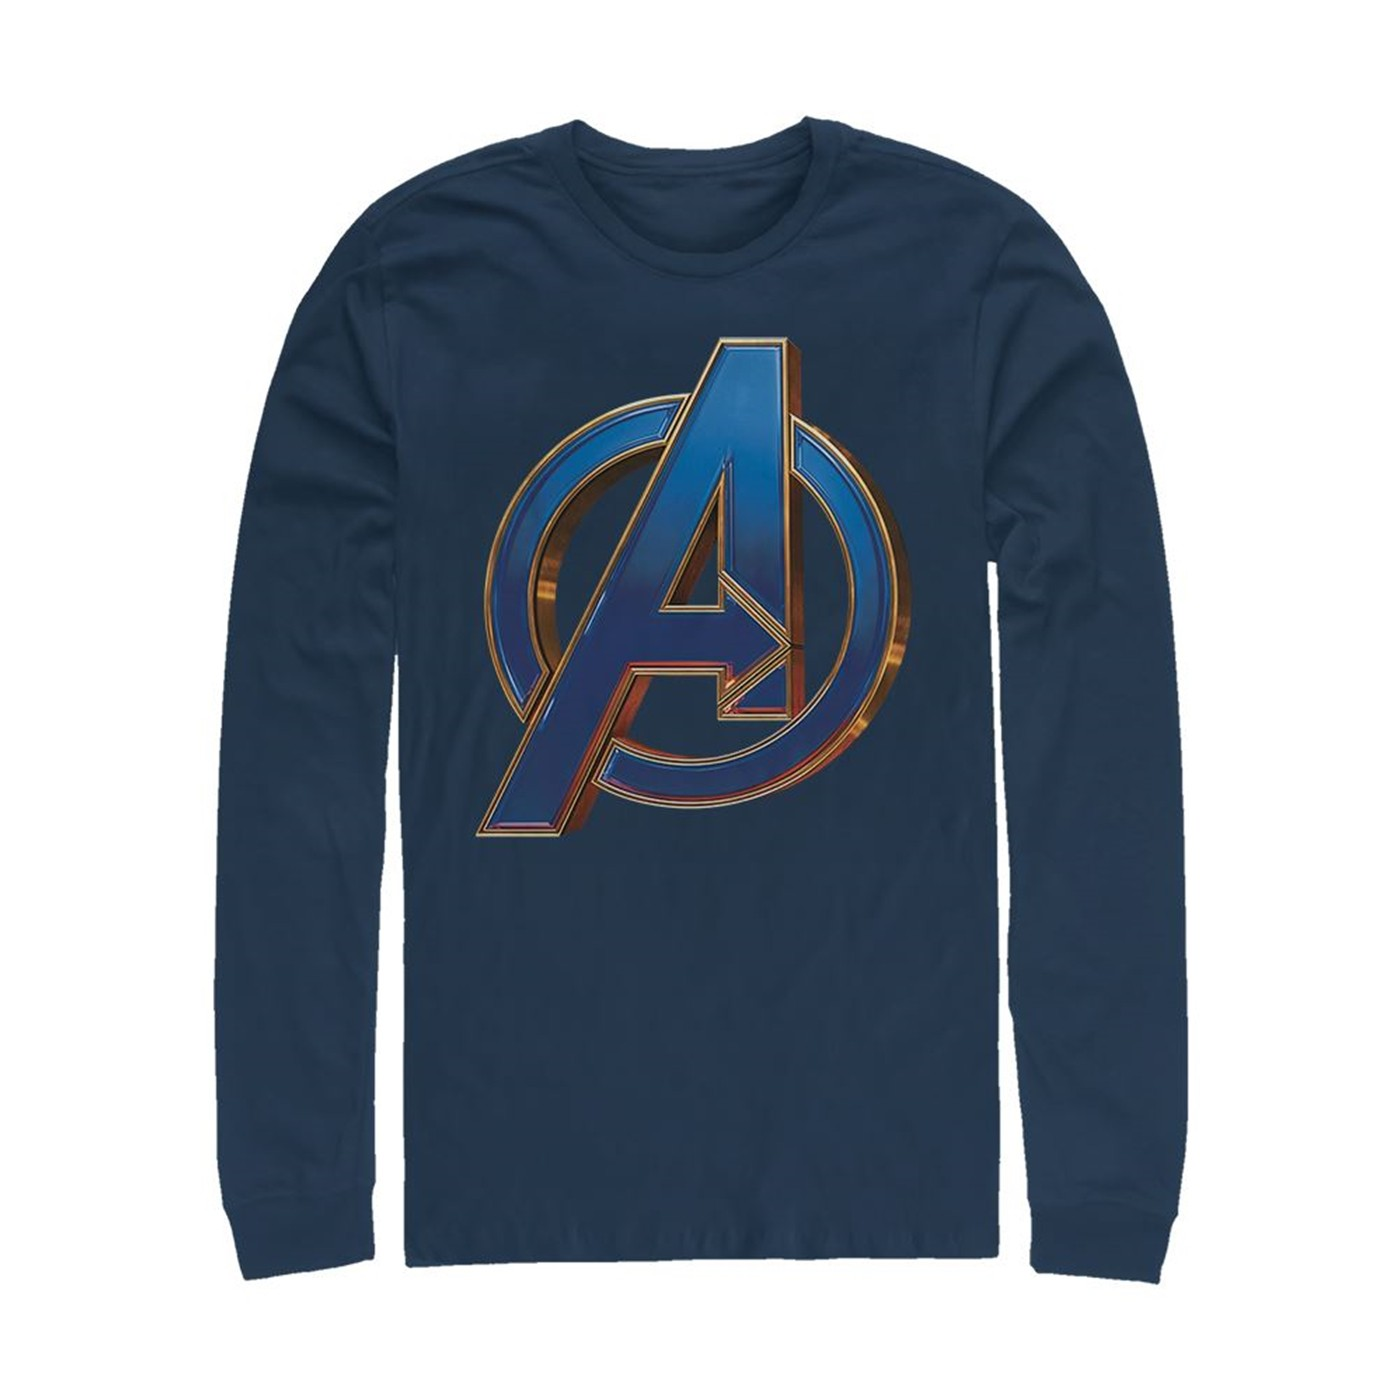 Avengers Endgame Blue Logo Long Sleeve